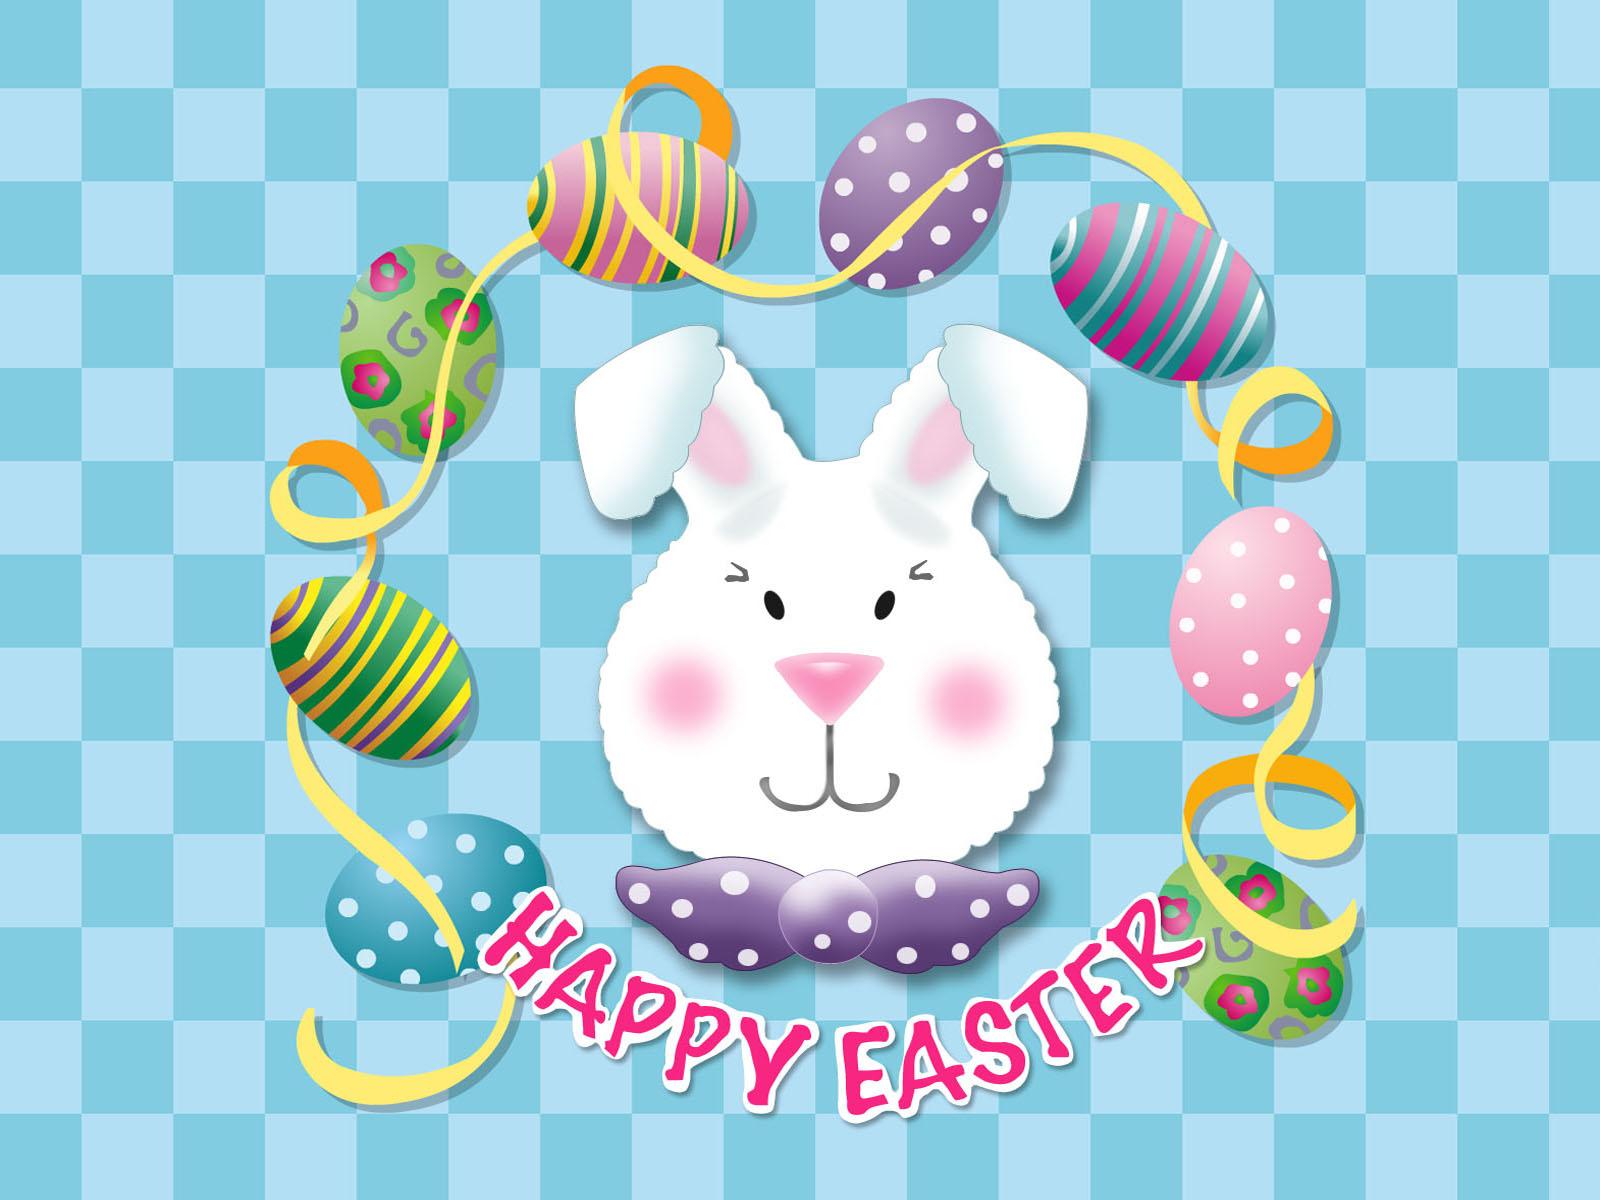 Animals Zoo Park Happy Easter Wallpapers for Desktop 1600x1200